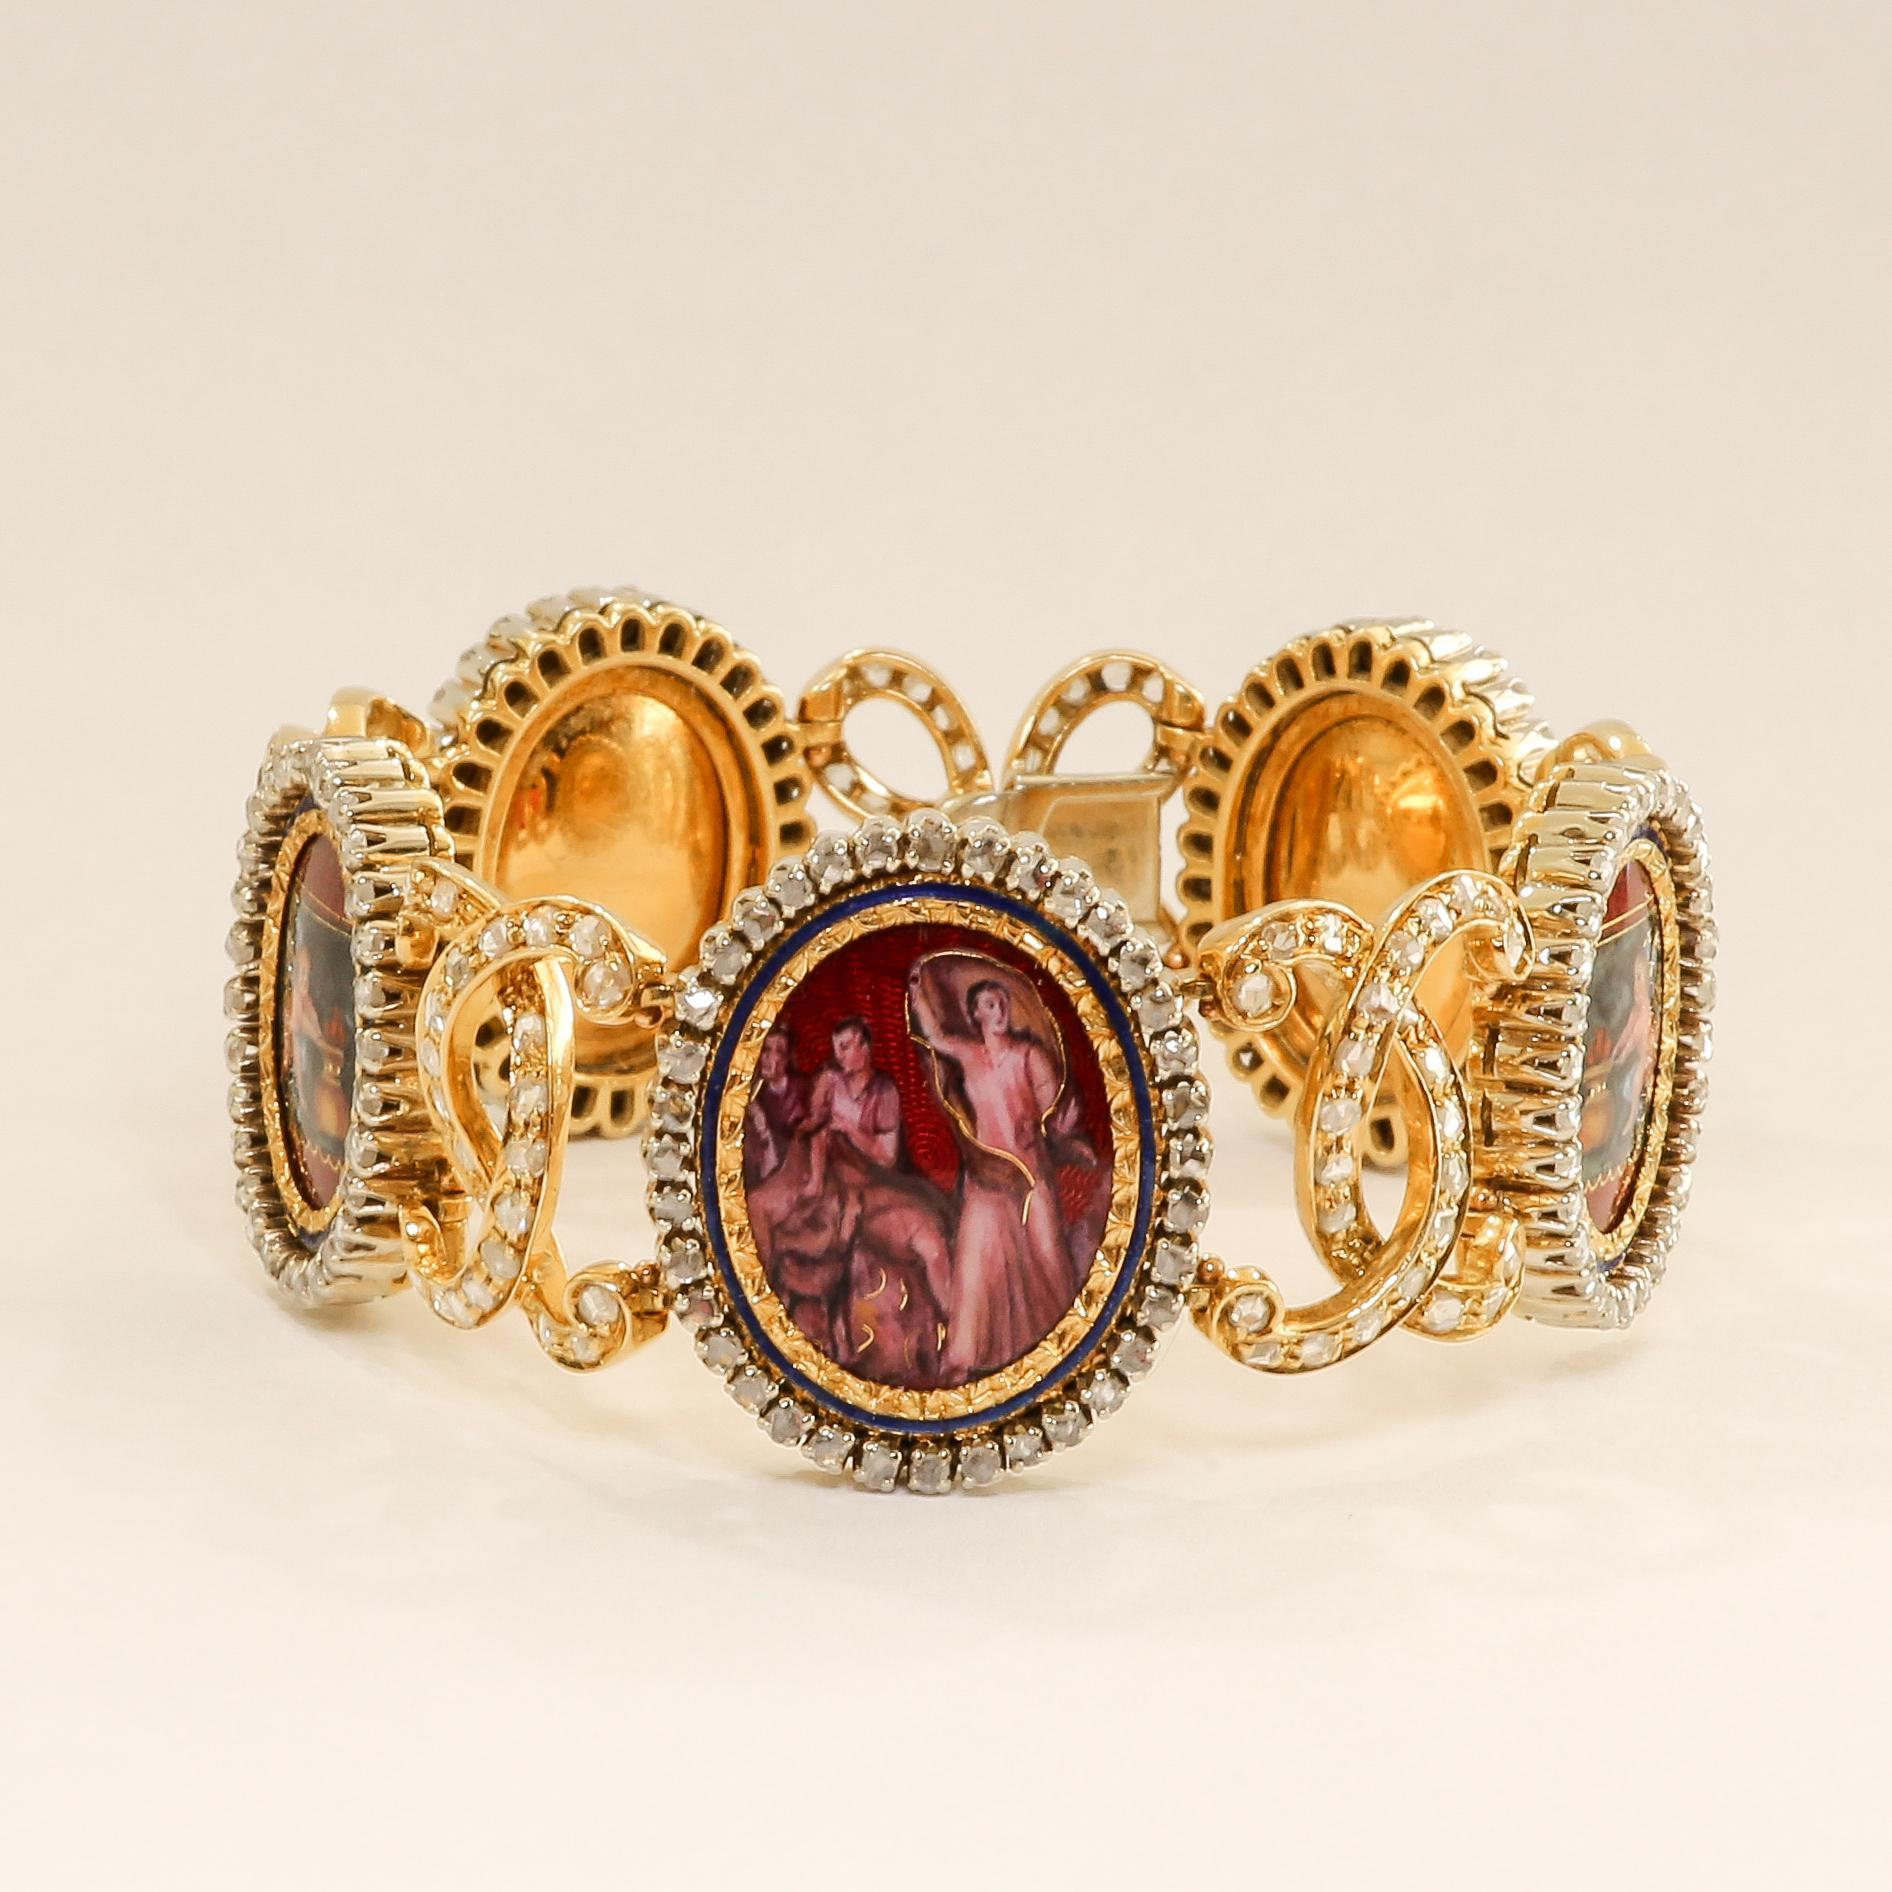 Circa 1900 Art Nouveau 18K Lady's Diamond Bracelet With Scenes Of Pompeii Frescoes